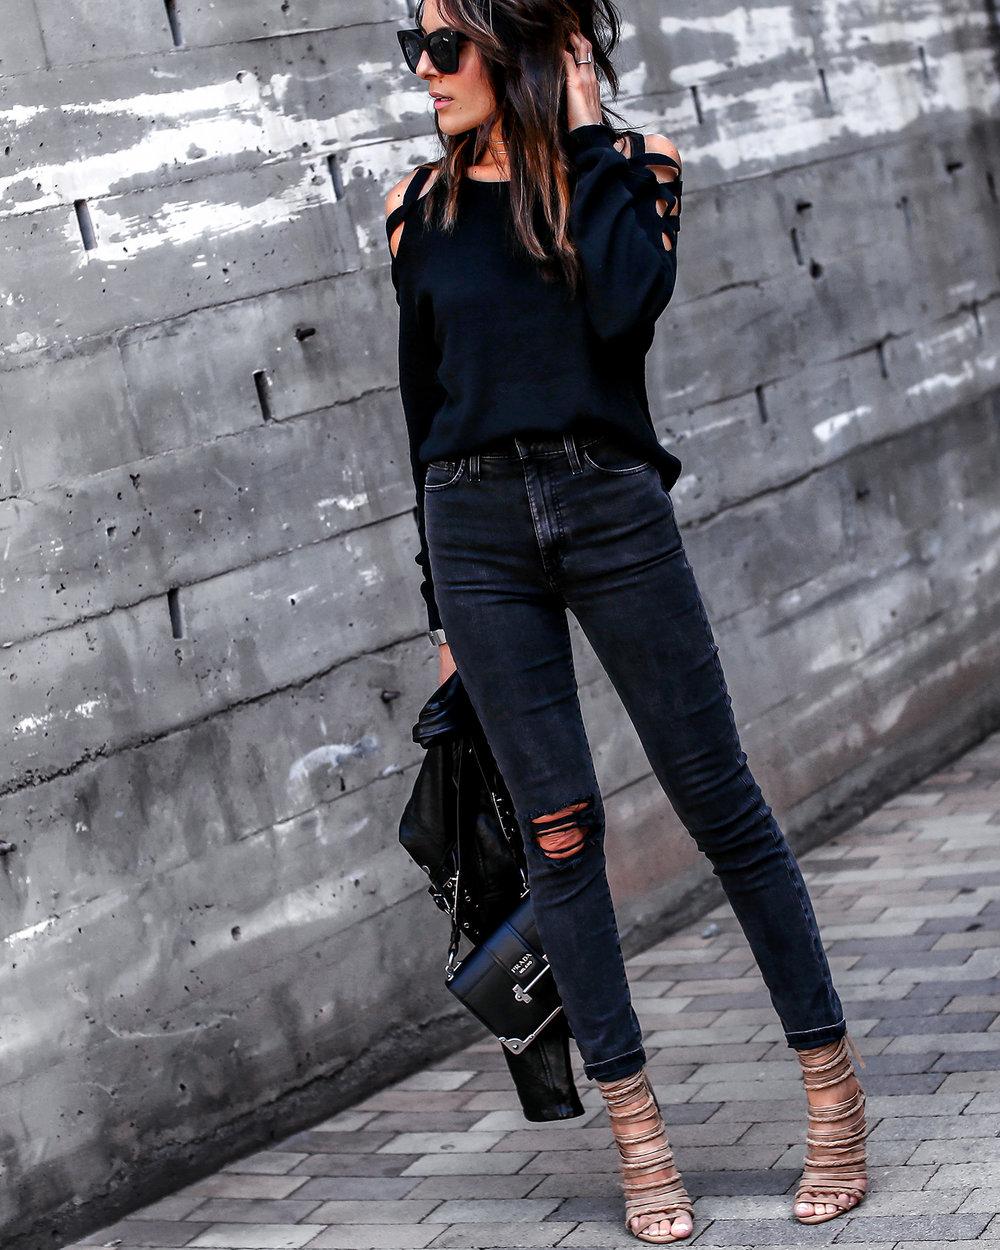 Joes Jeans Acid Wash Denim Cutout Sweater Steve Madden Wrap Sandals Prada Bag.jpg